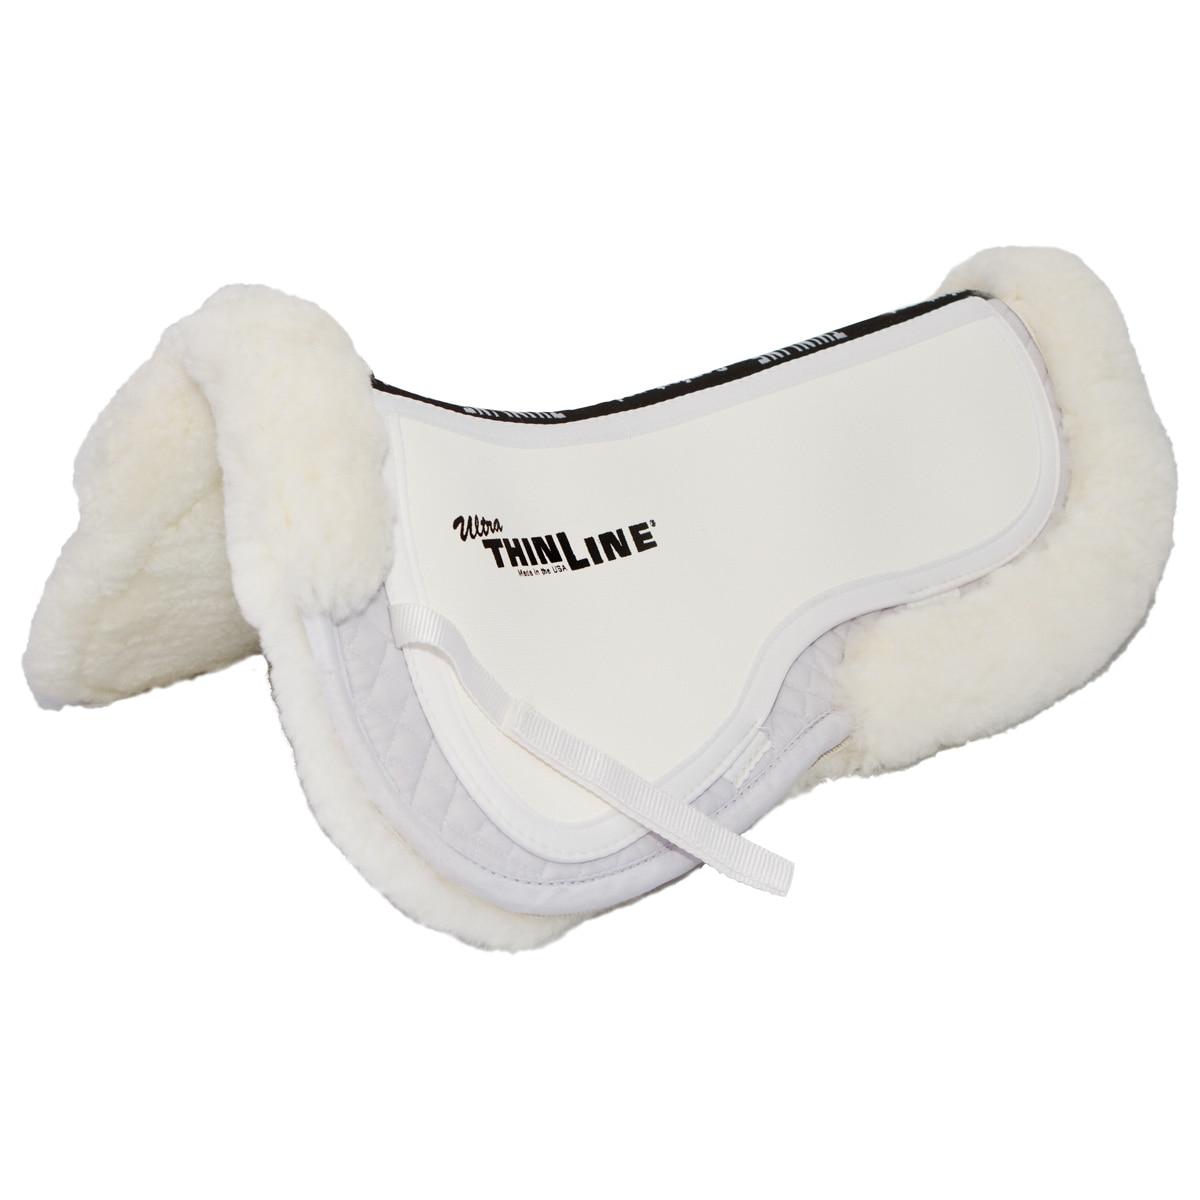 ThinLine Sheepskin Comfort Half Pad